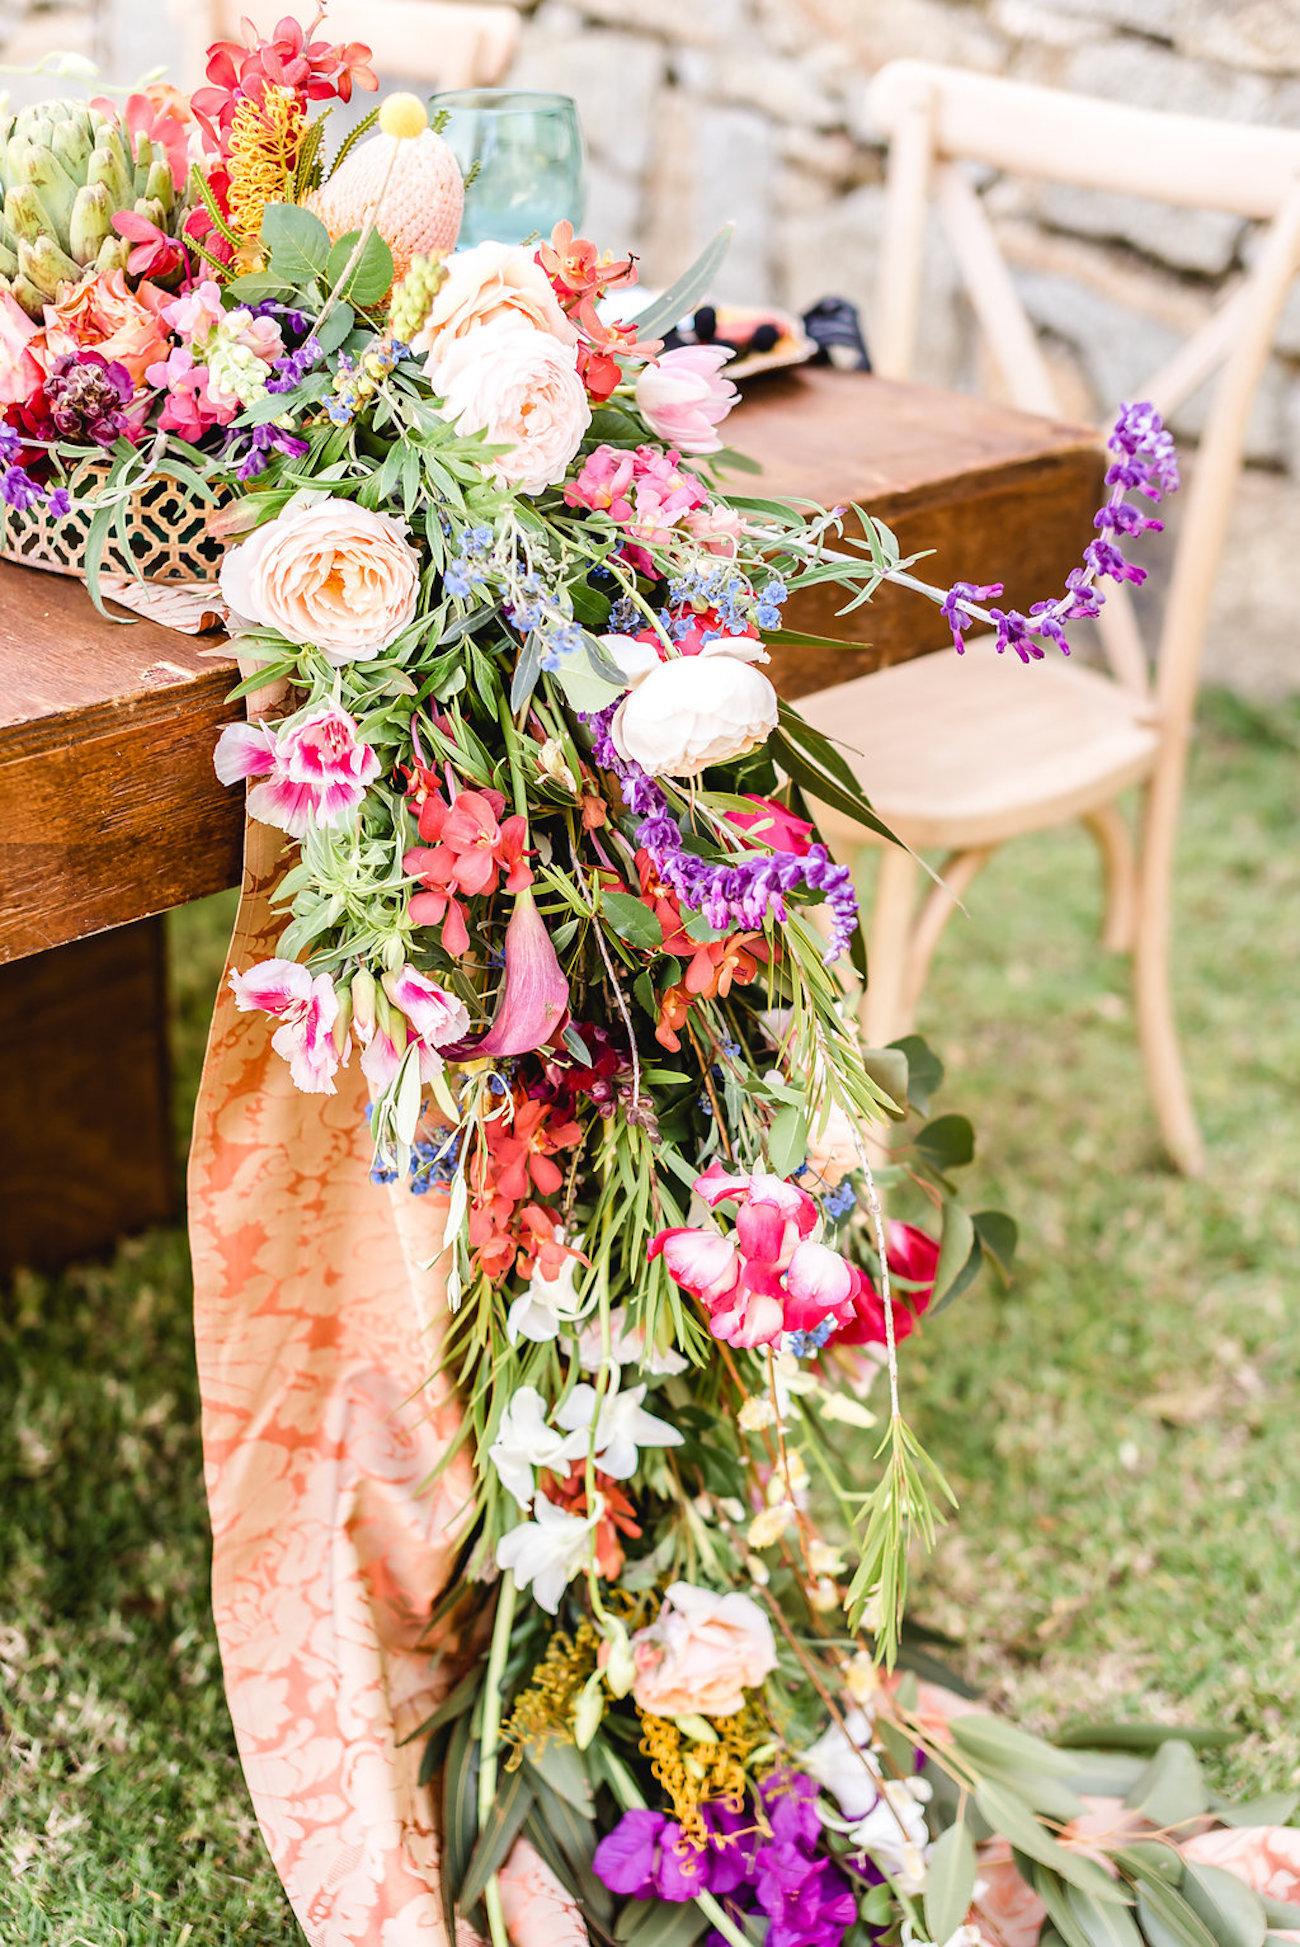 Colorful Floral Runner | Credit: Jacoba Clothing/PhotoKru